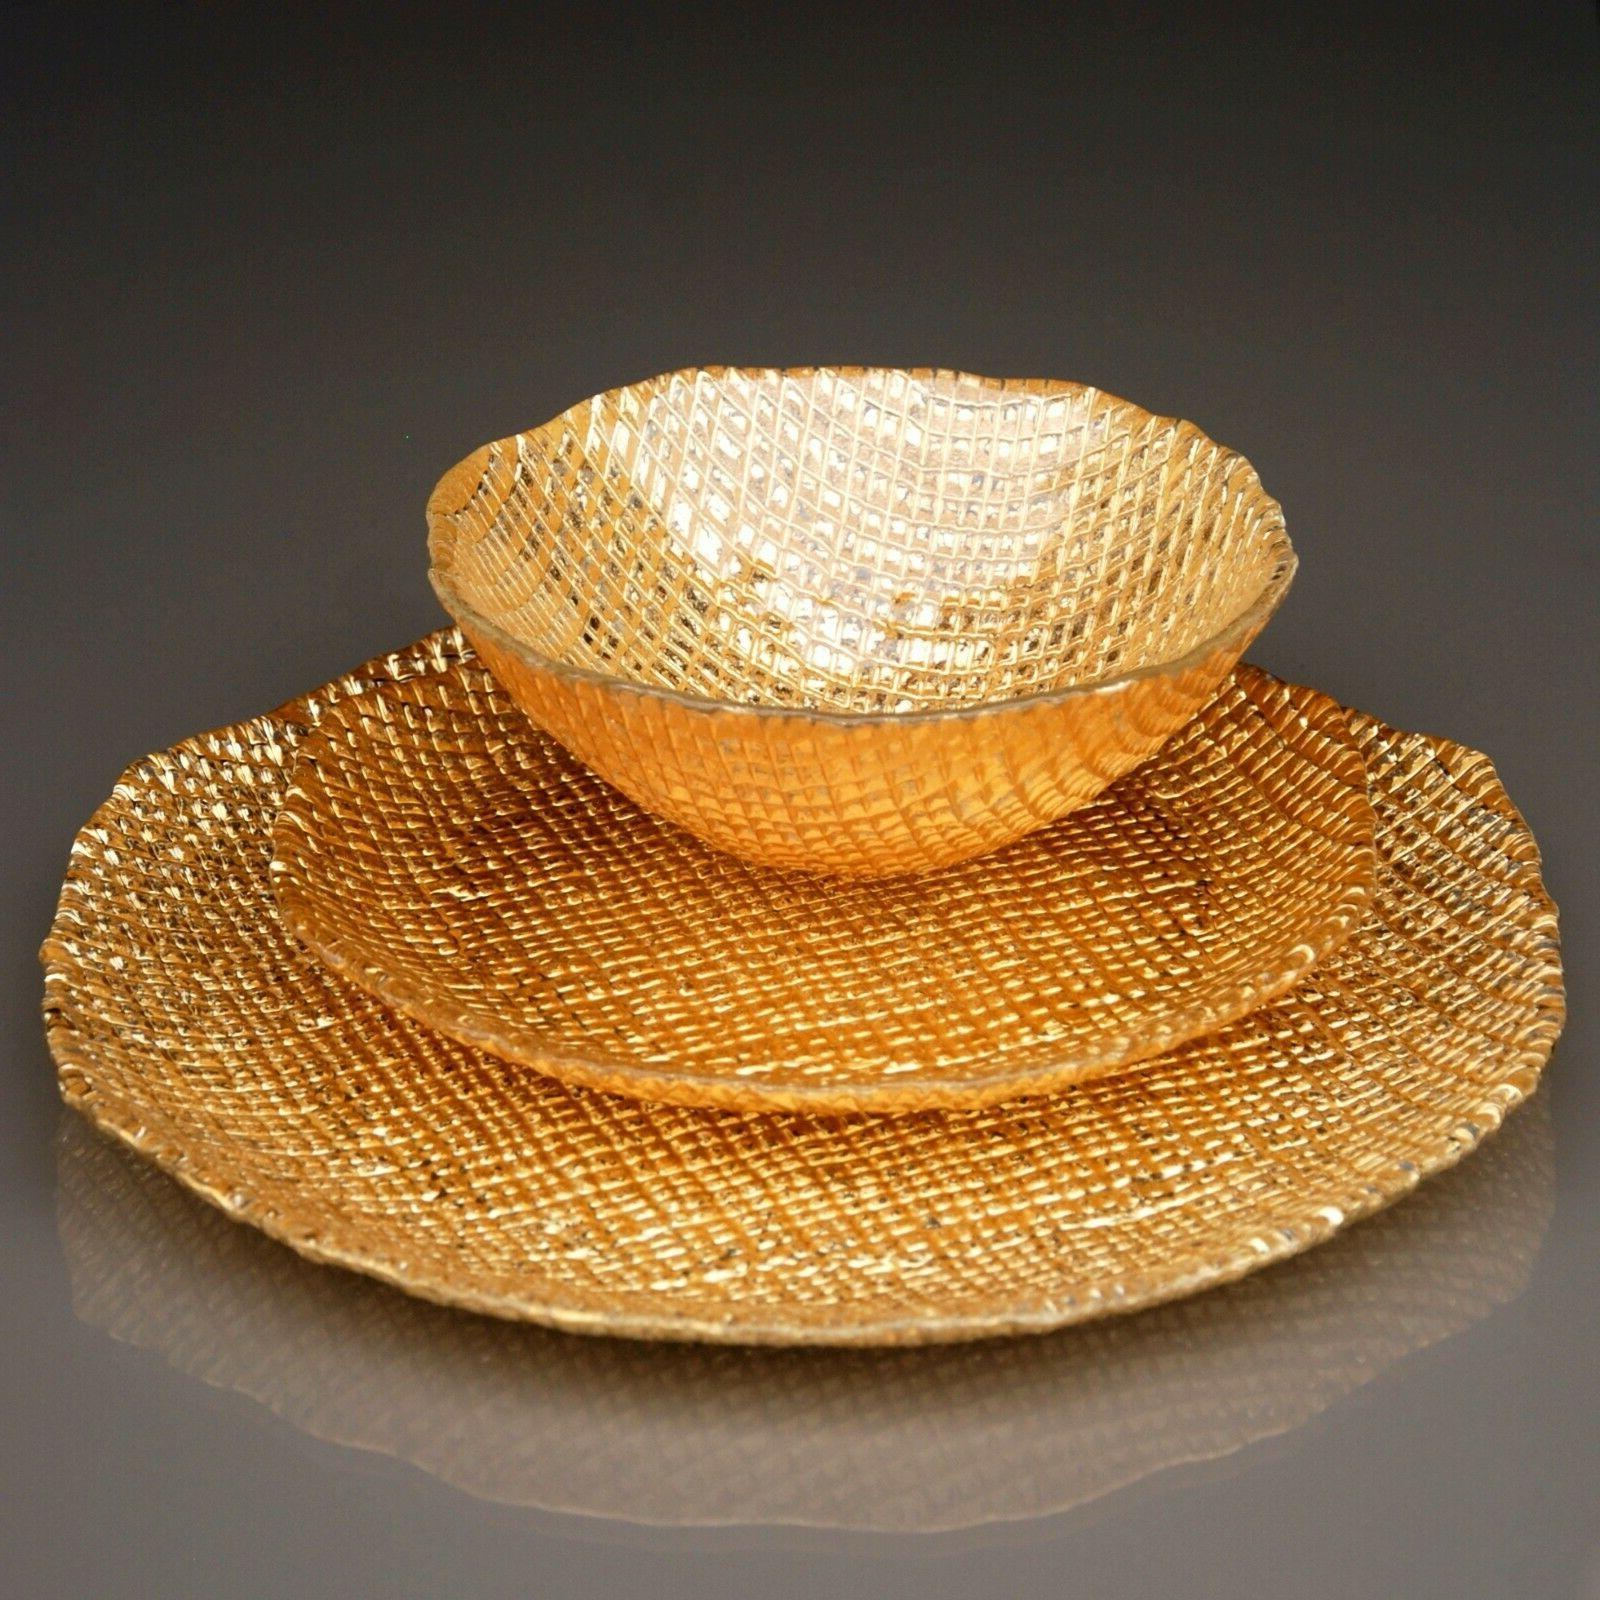 lumiere 12 pcs gold dinnerware set